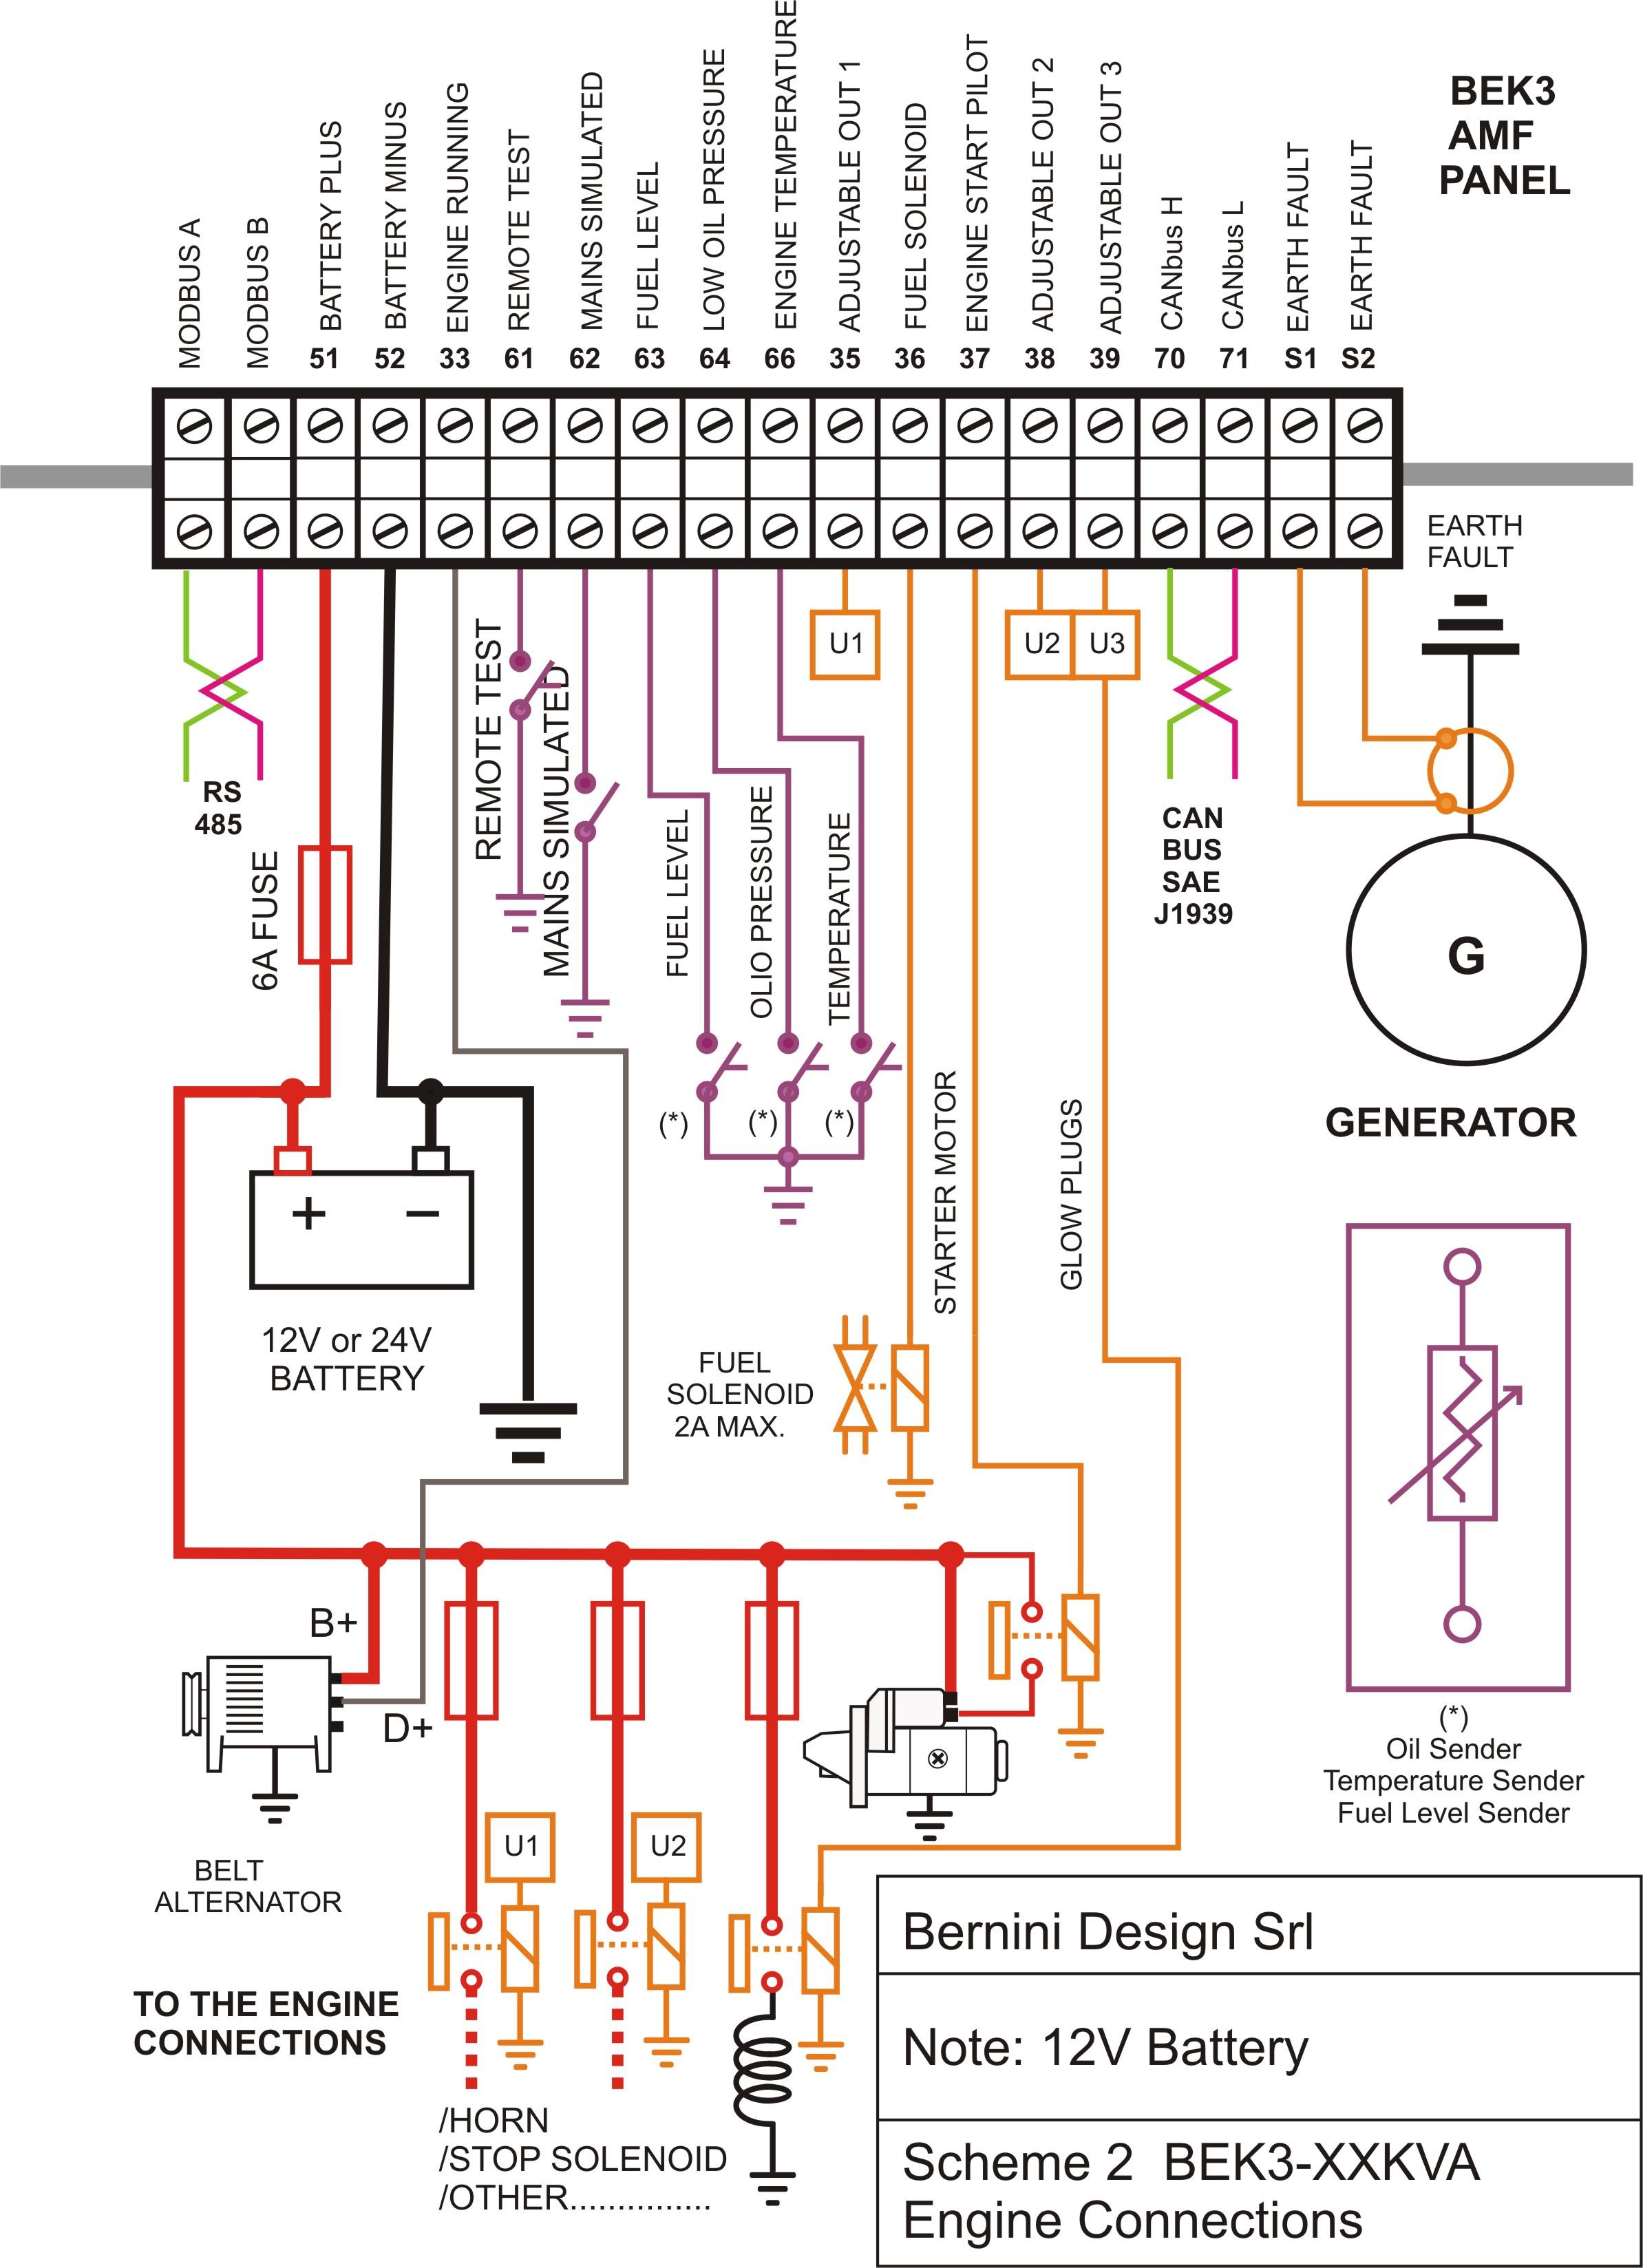 Plc Panel Wiring Diagram Pdf | Manual E-Books - Simple Wiring Diagram